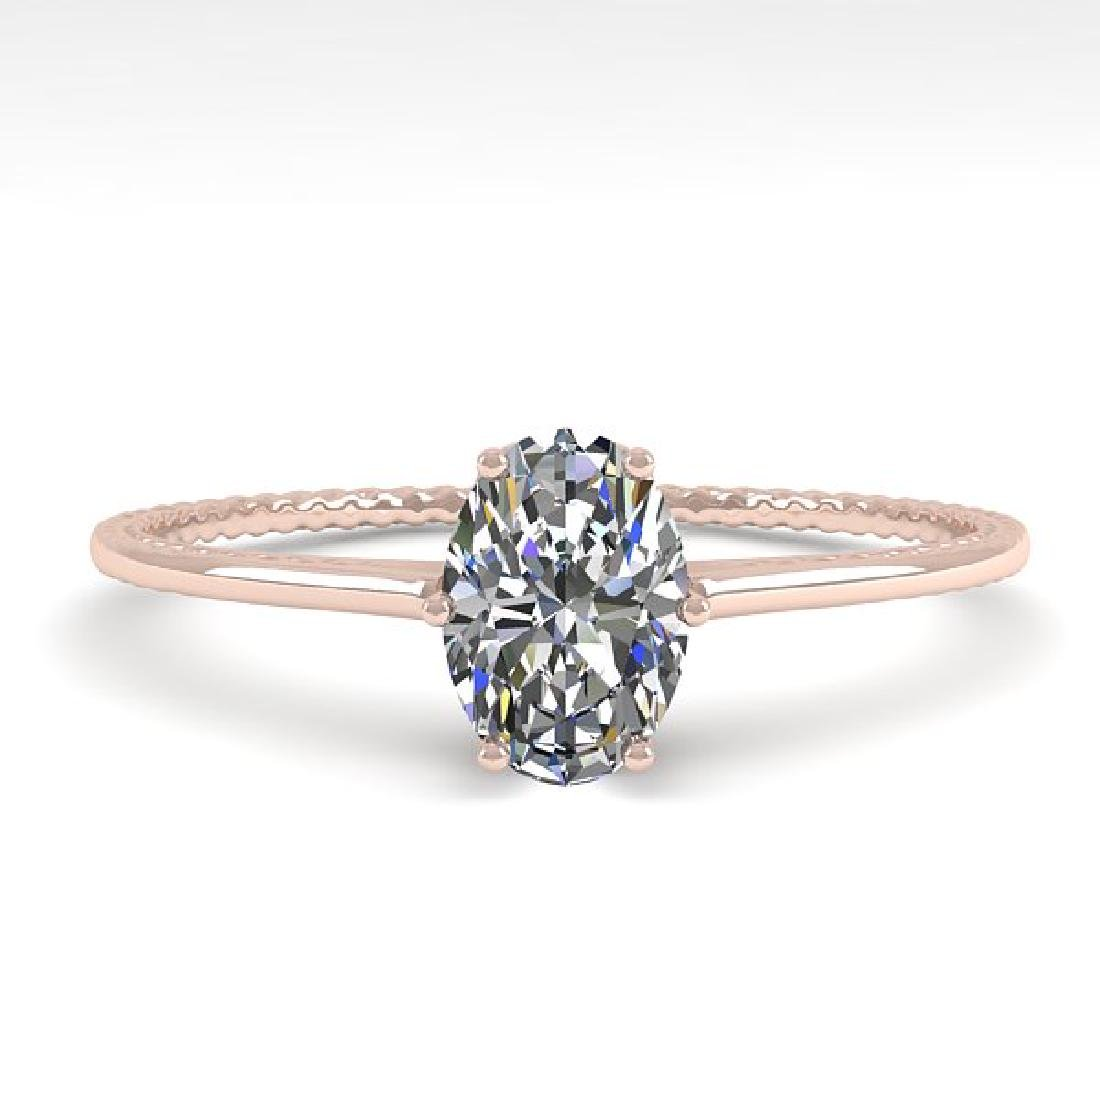 1.0 CTW VS/SI Oval Cut Diamond Art Deco Ring 14K Rose